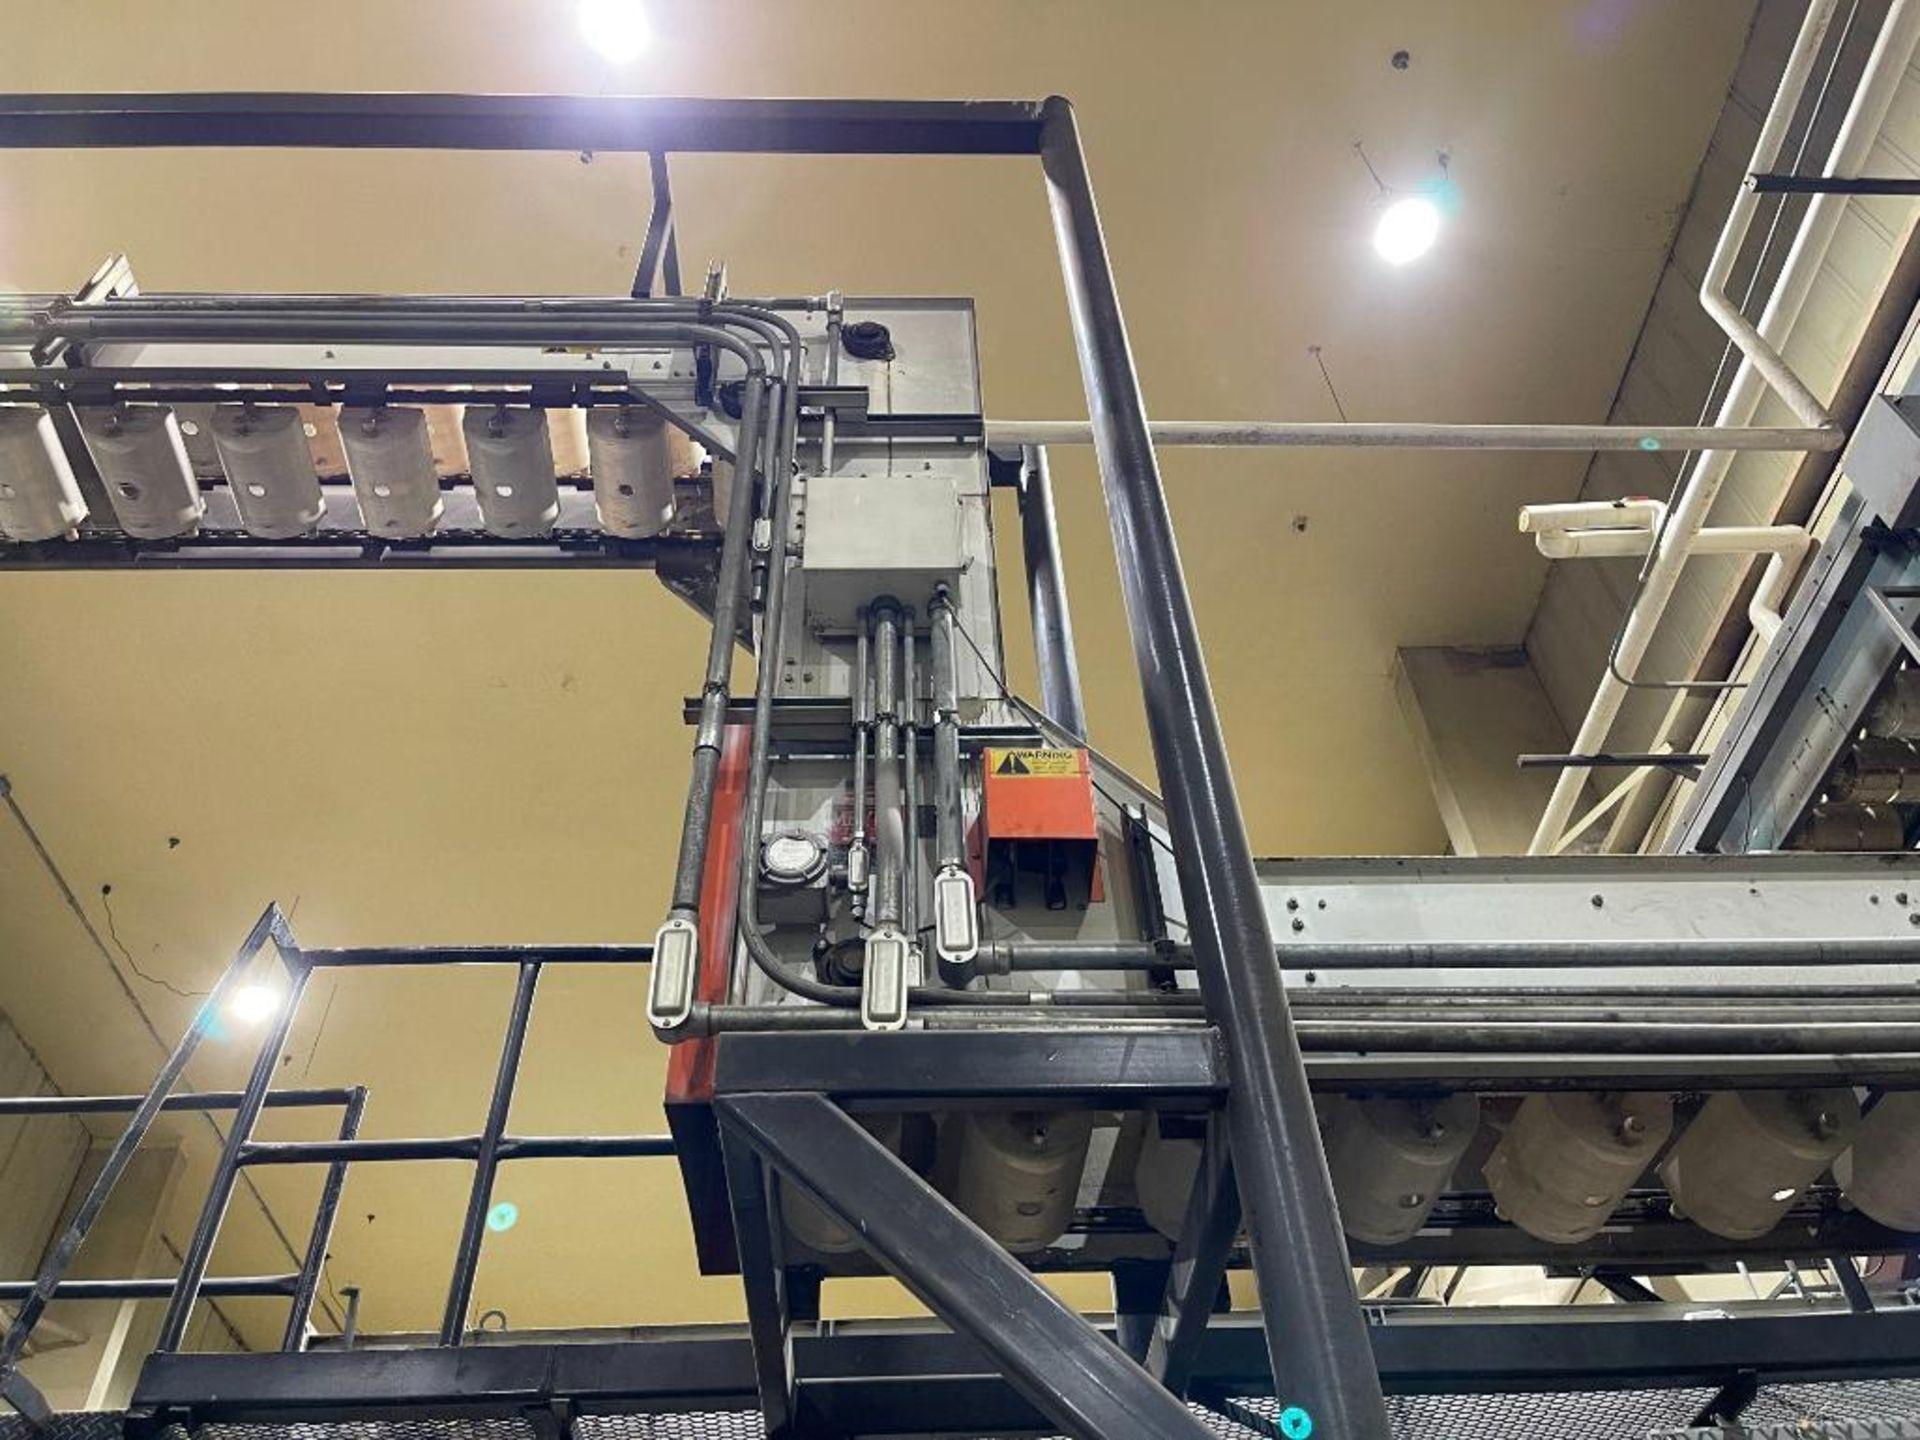 Meyer horizontal bucket elevator, model PC-072-12-BCC - Image 16 of 18